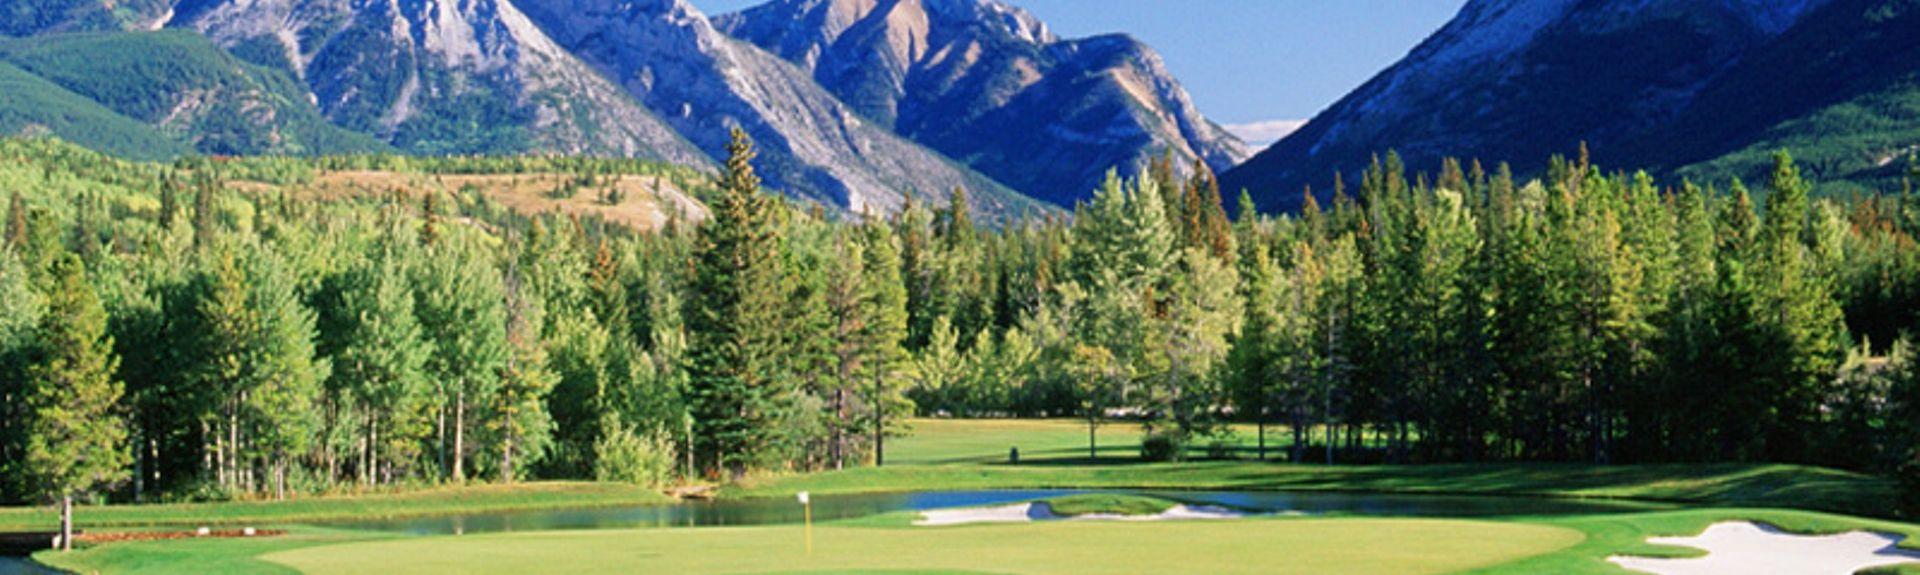 Chutes Bow, Banff, Alberta, Canada